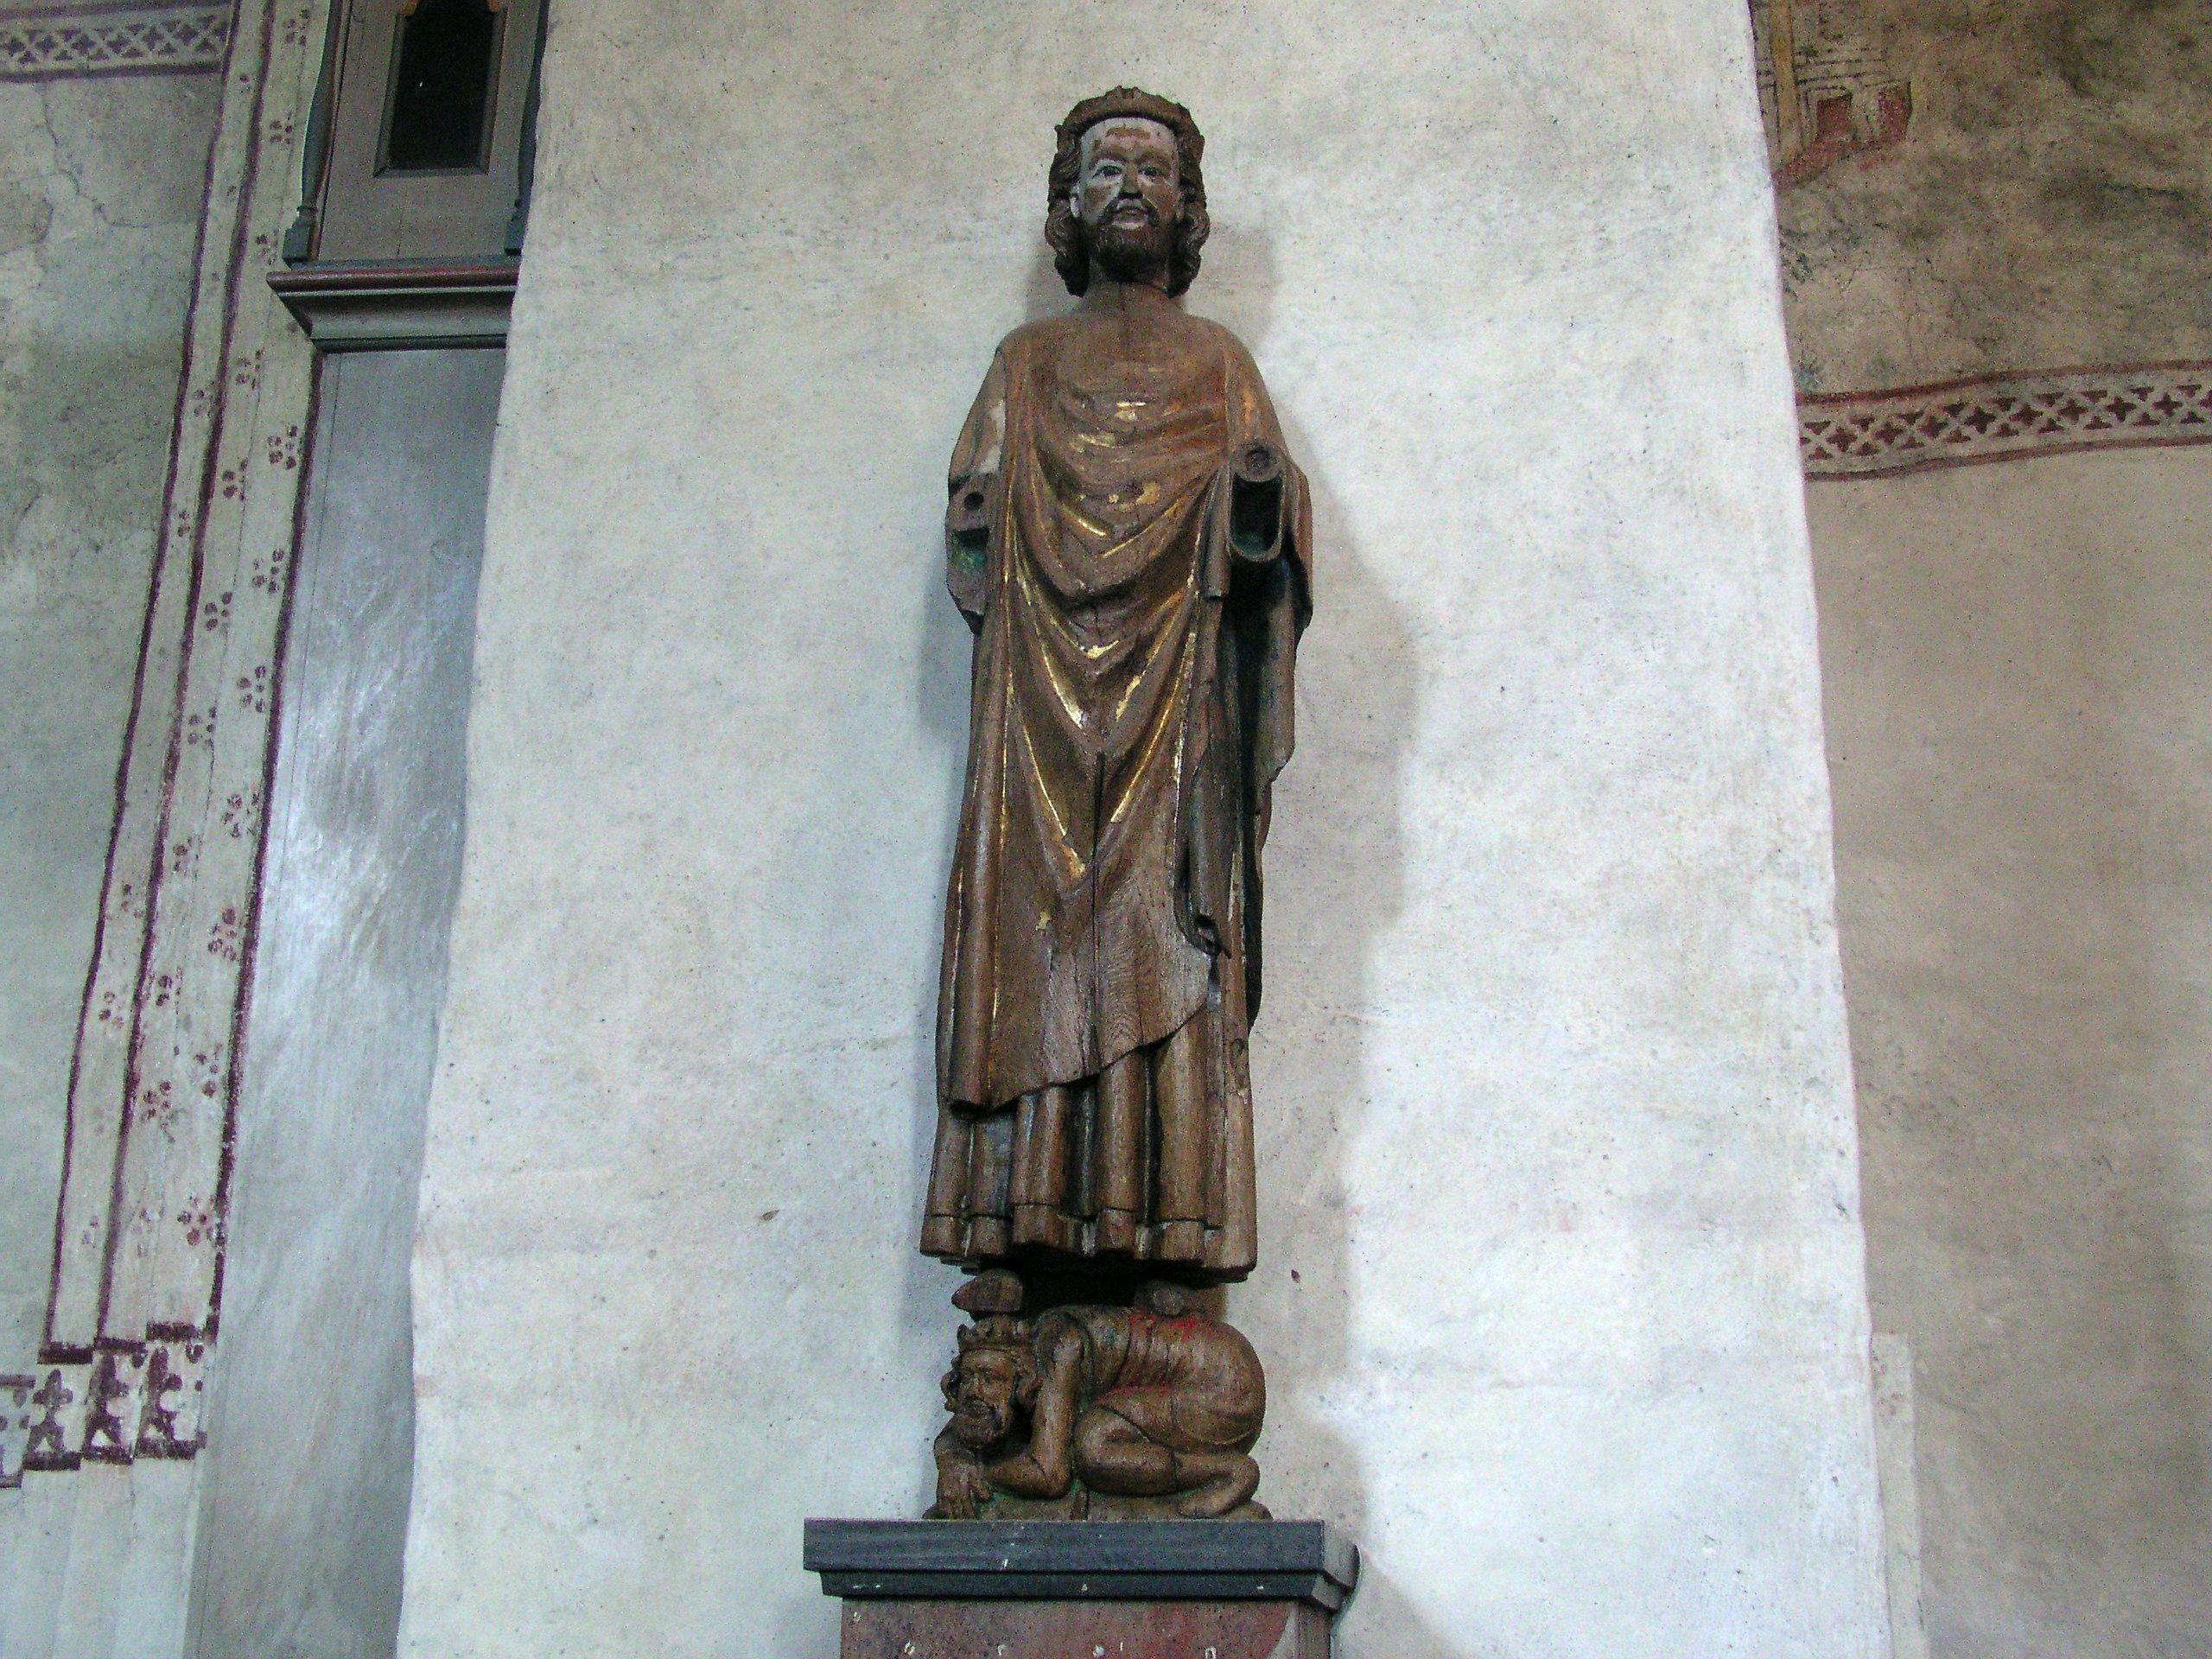 http://upload.wikimedia.org/wikipedia/commons/b/b8/Gamla_Uppsala_kyrka-Statue1.jpg